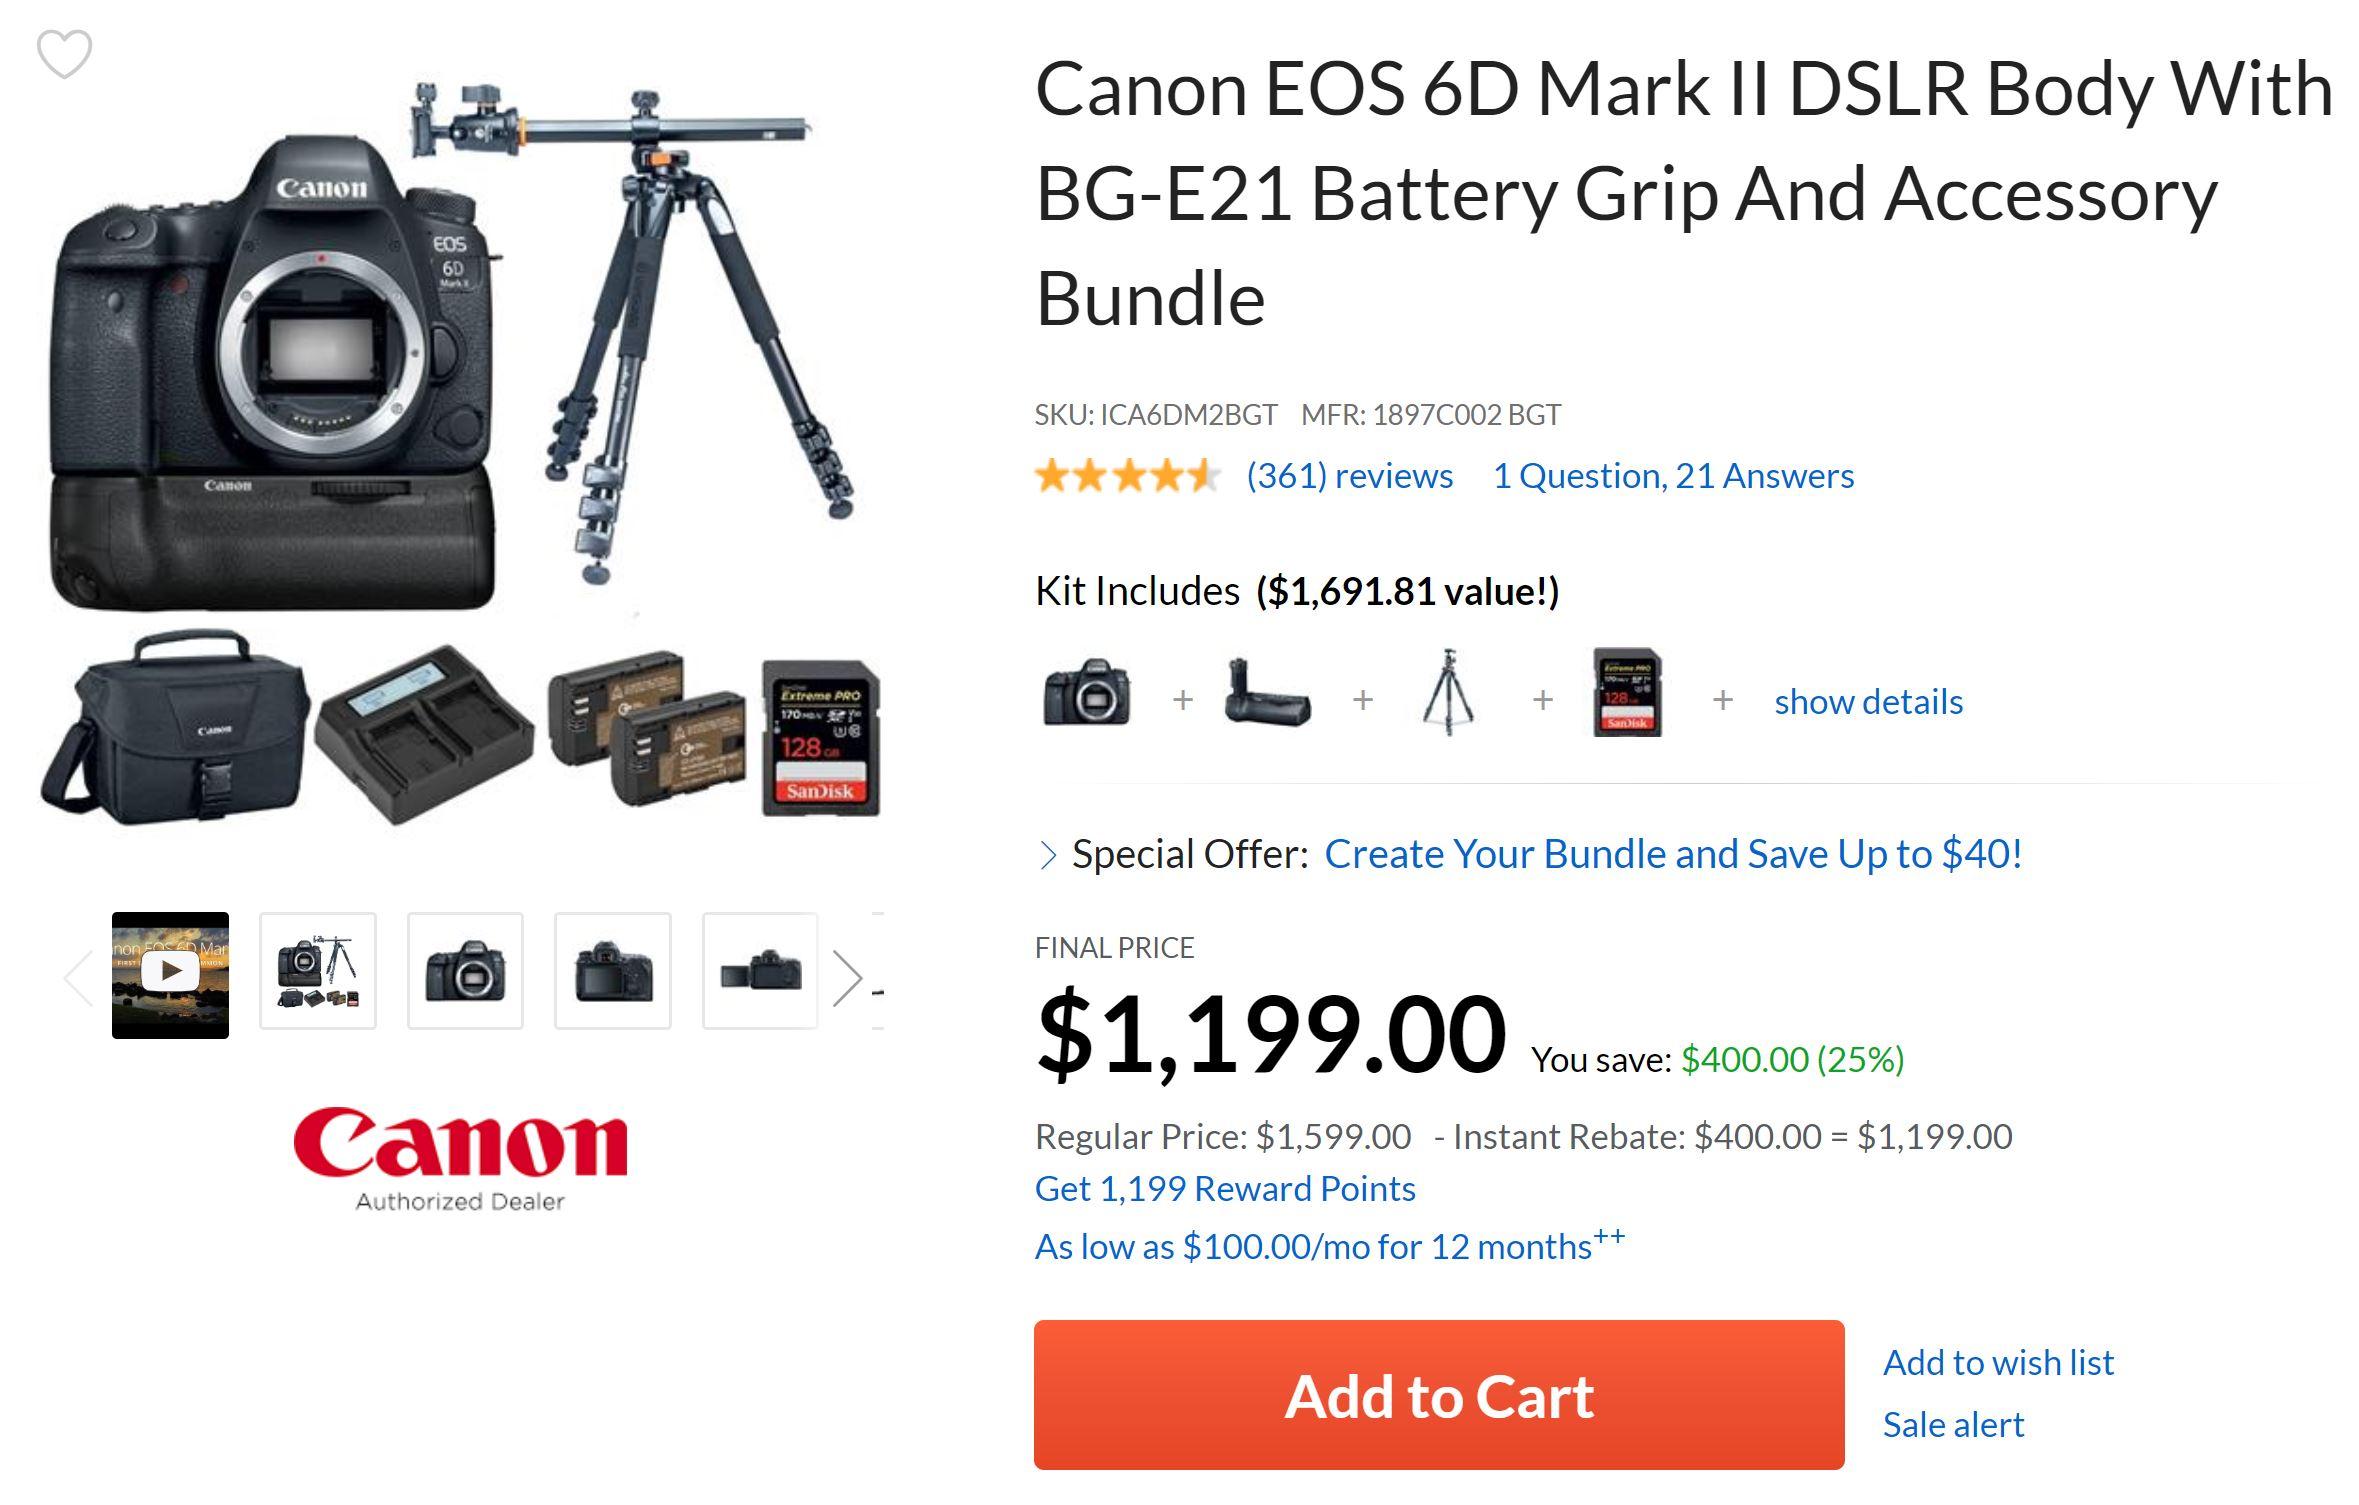 Hot Deal – Canon 6D Mark II w/ BG-E21 + Tripod + 128GB SDXC + More for $1,199 at Adorama !